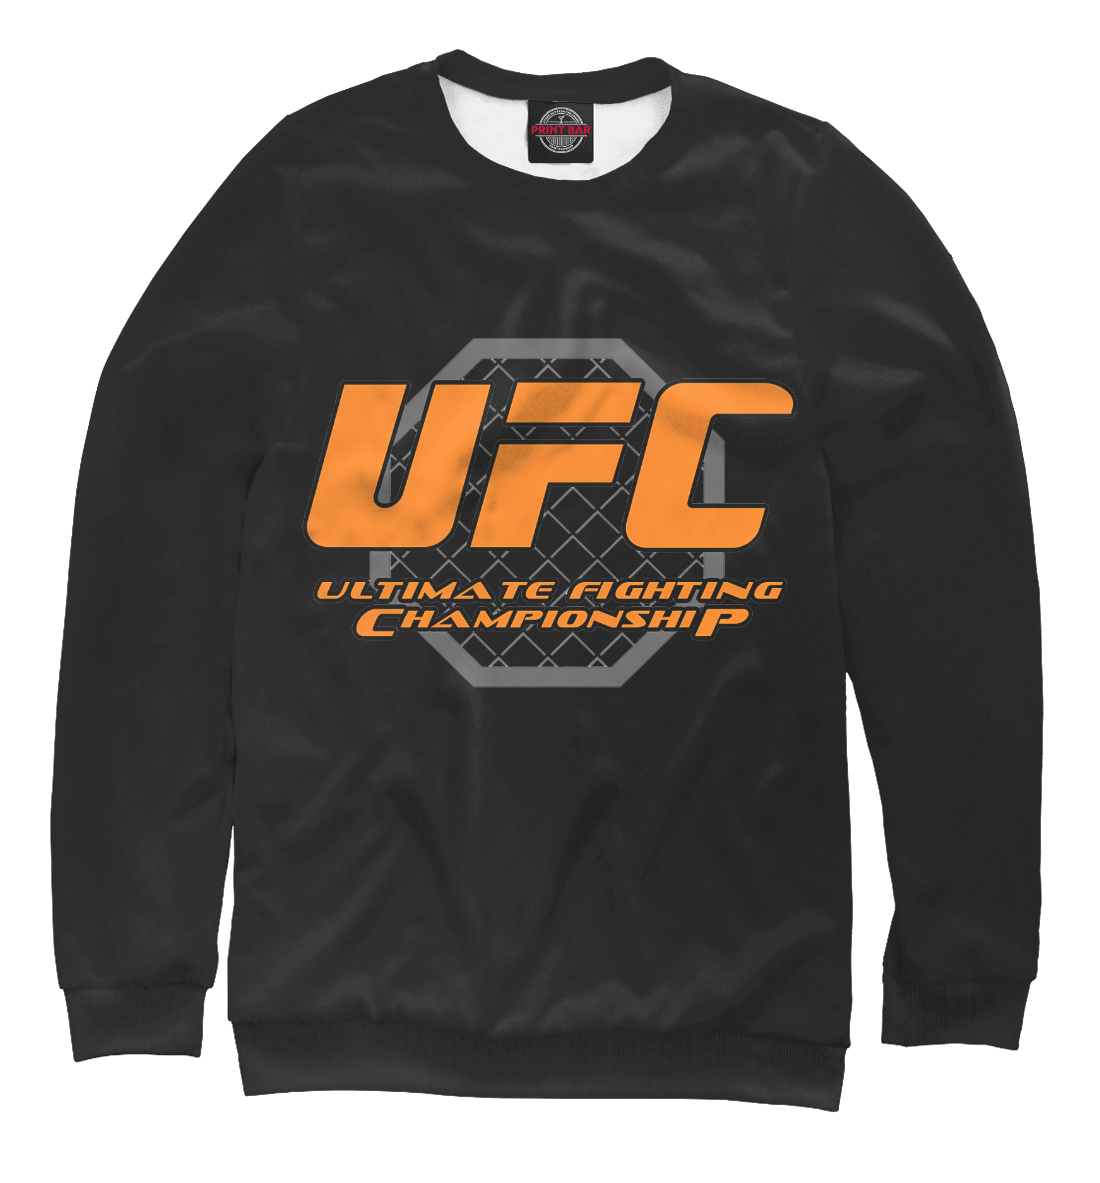 Купить Ultimate Fighting Championship, Printbar, Свитшоты, MNU-349331-swi-2